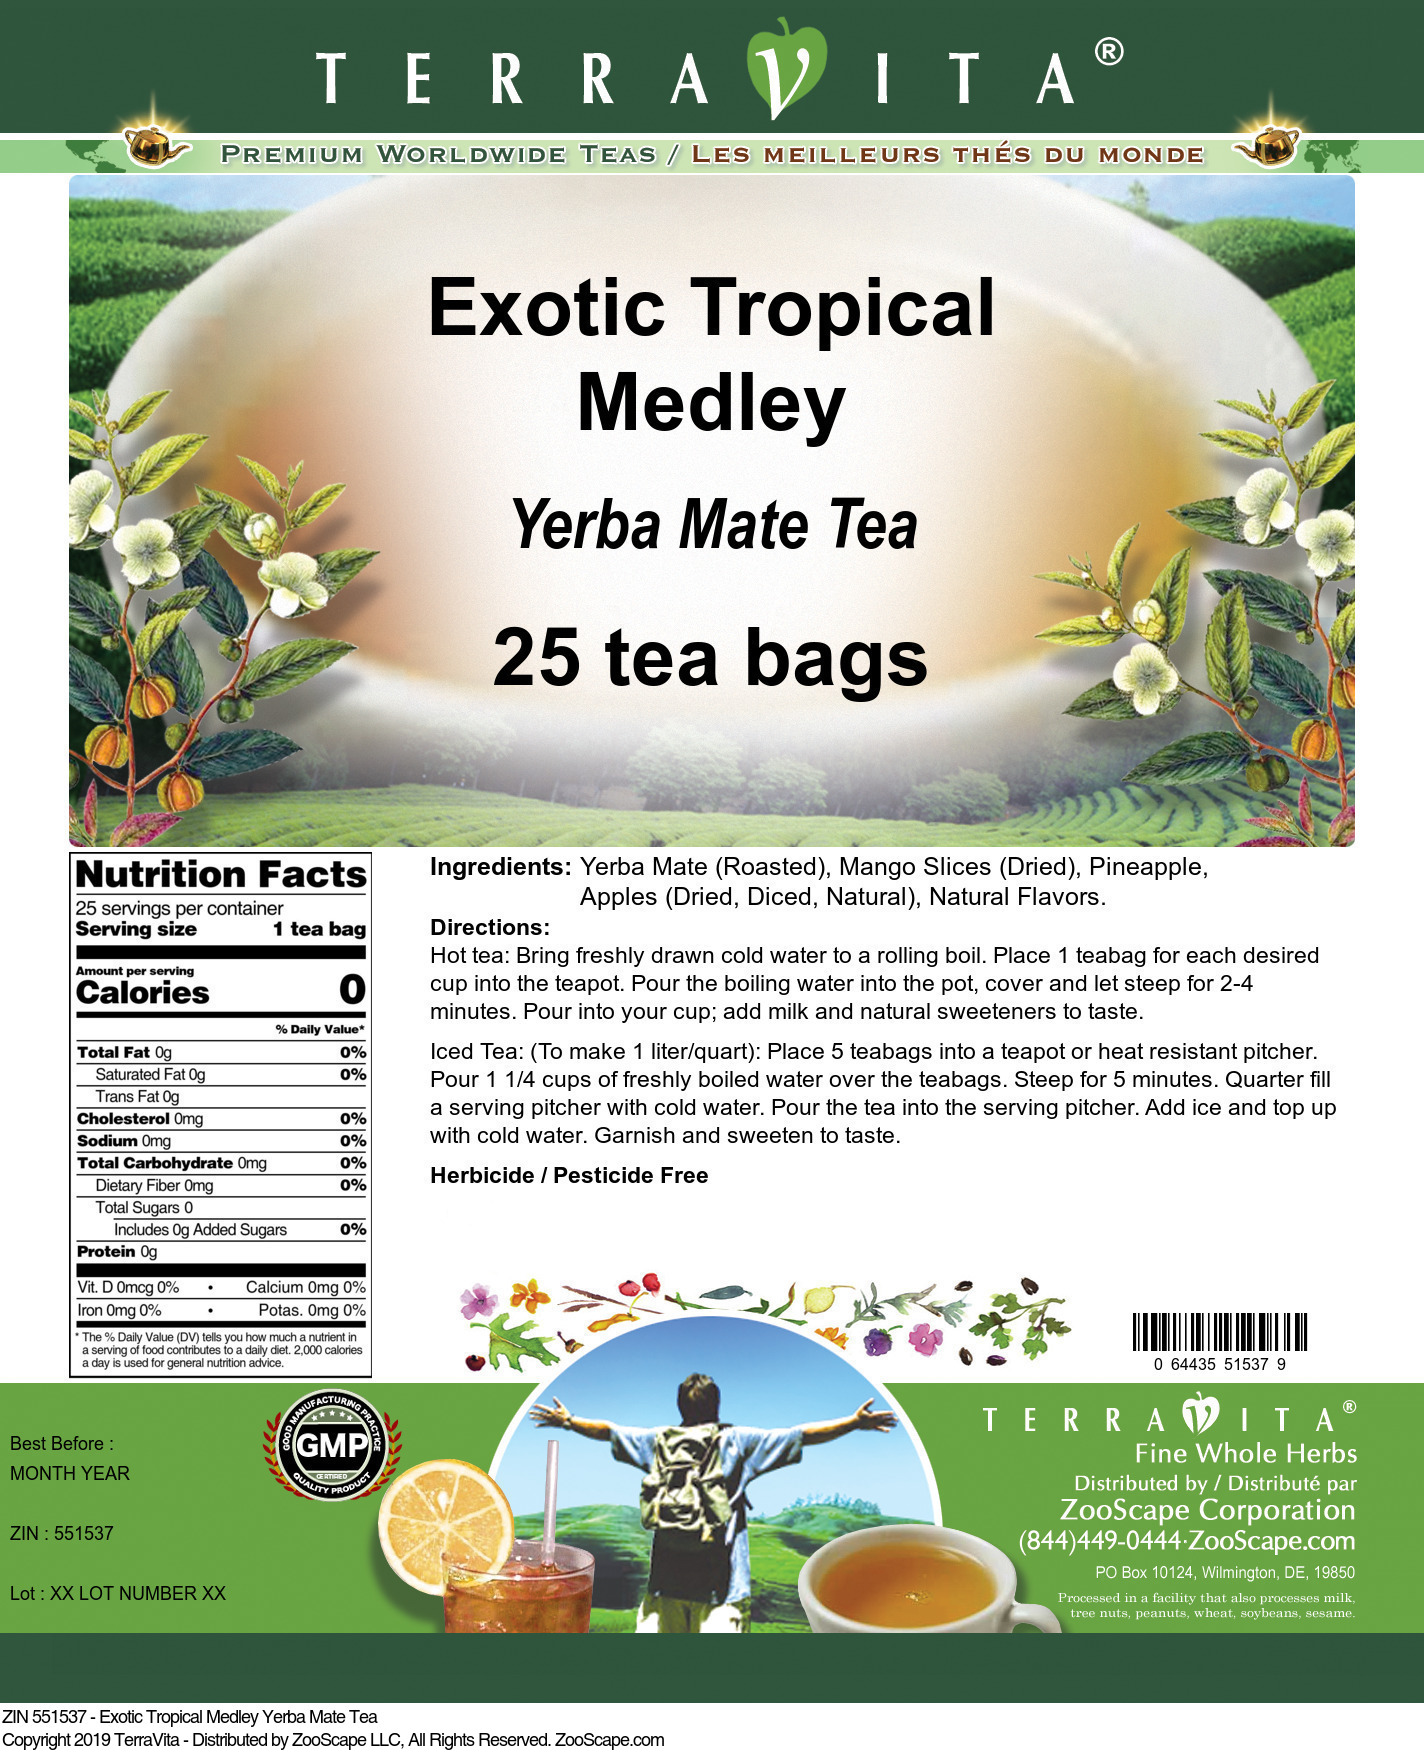 Exotic Tropical Medley Yerba Mate